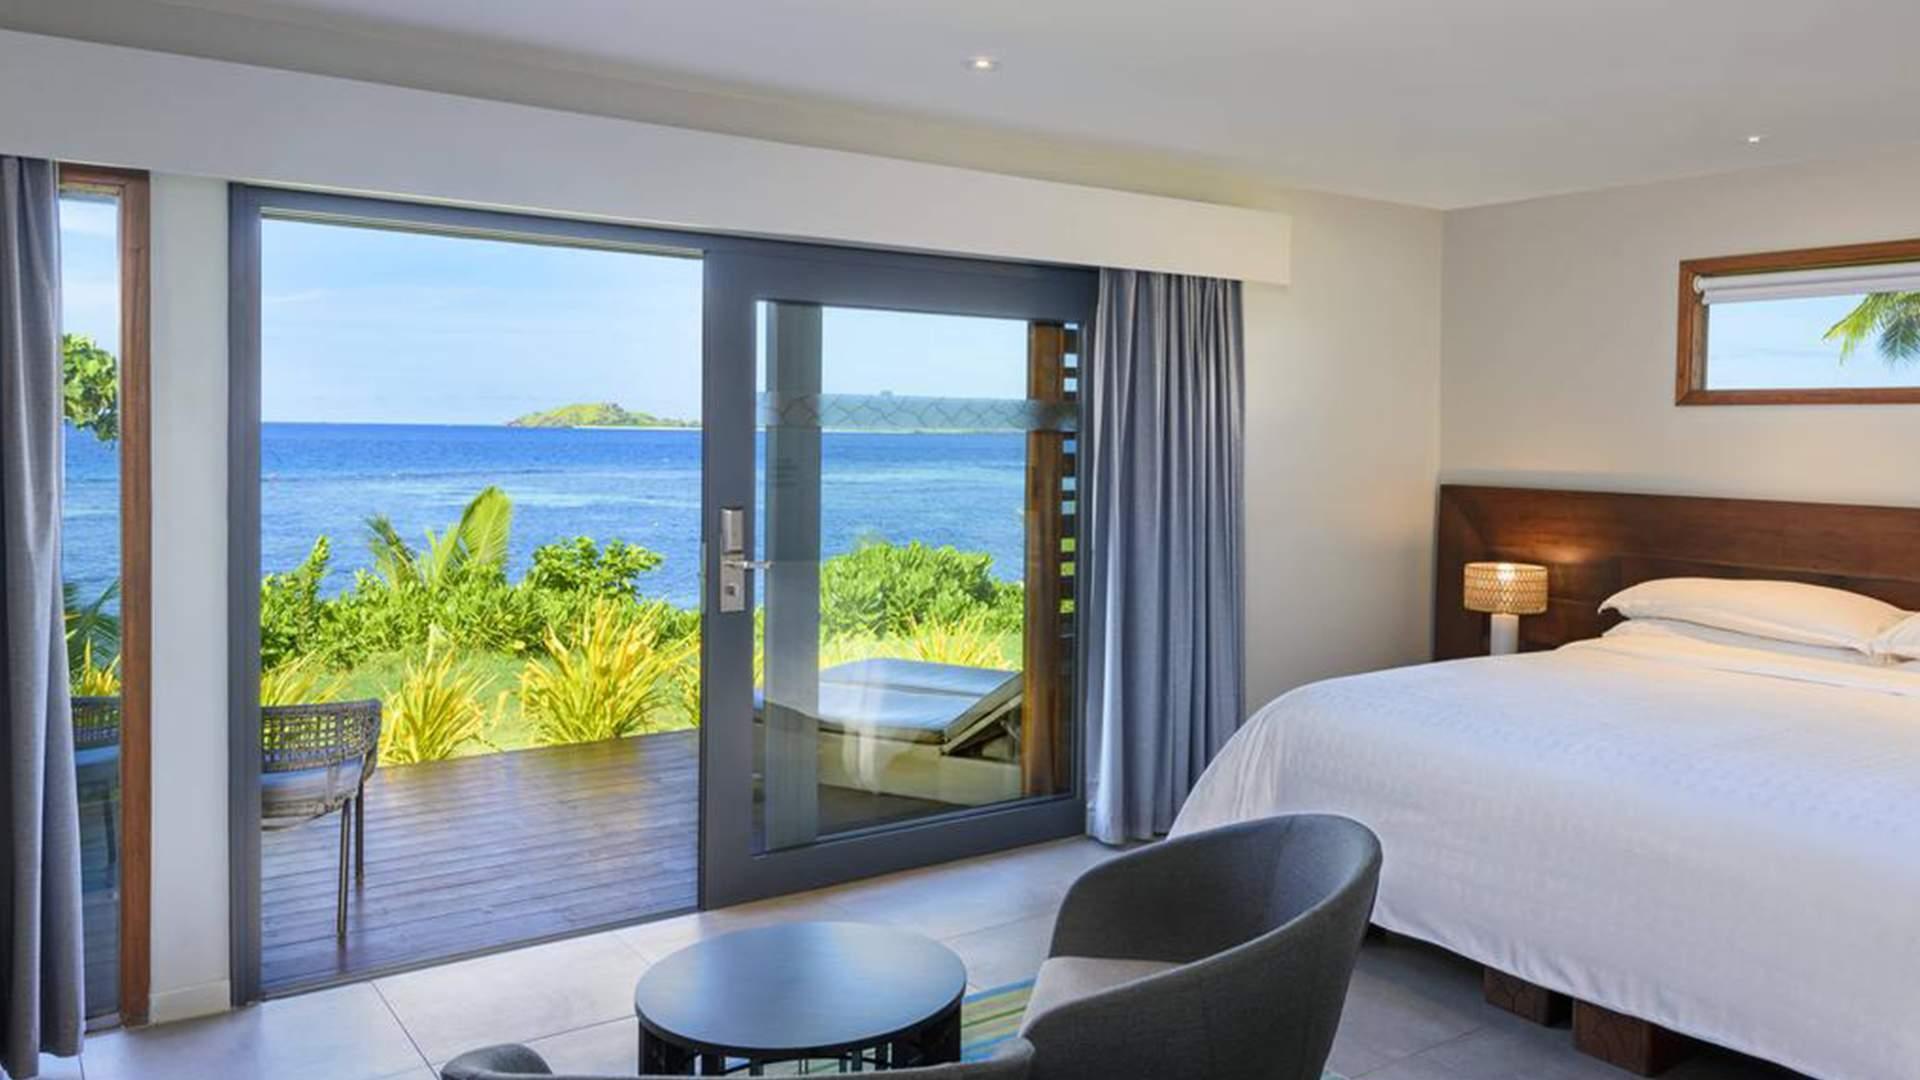 Ocean Front image 1 at Sheraton Resort & Spa, Tokoriki Island, Fiji by null, null, Fiji